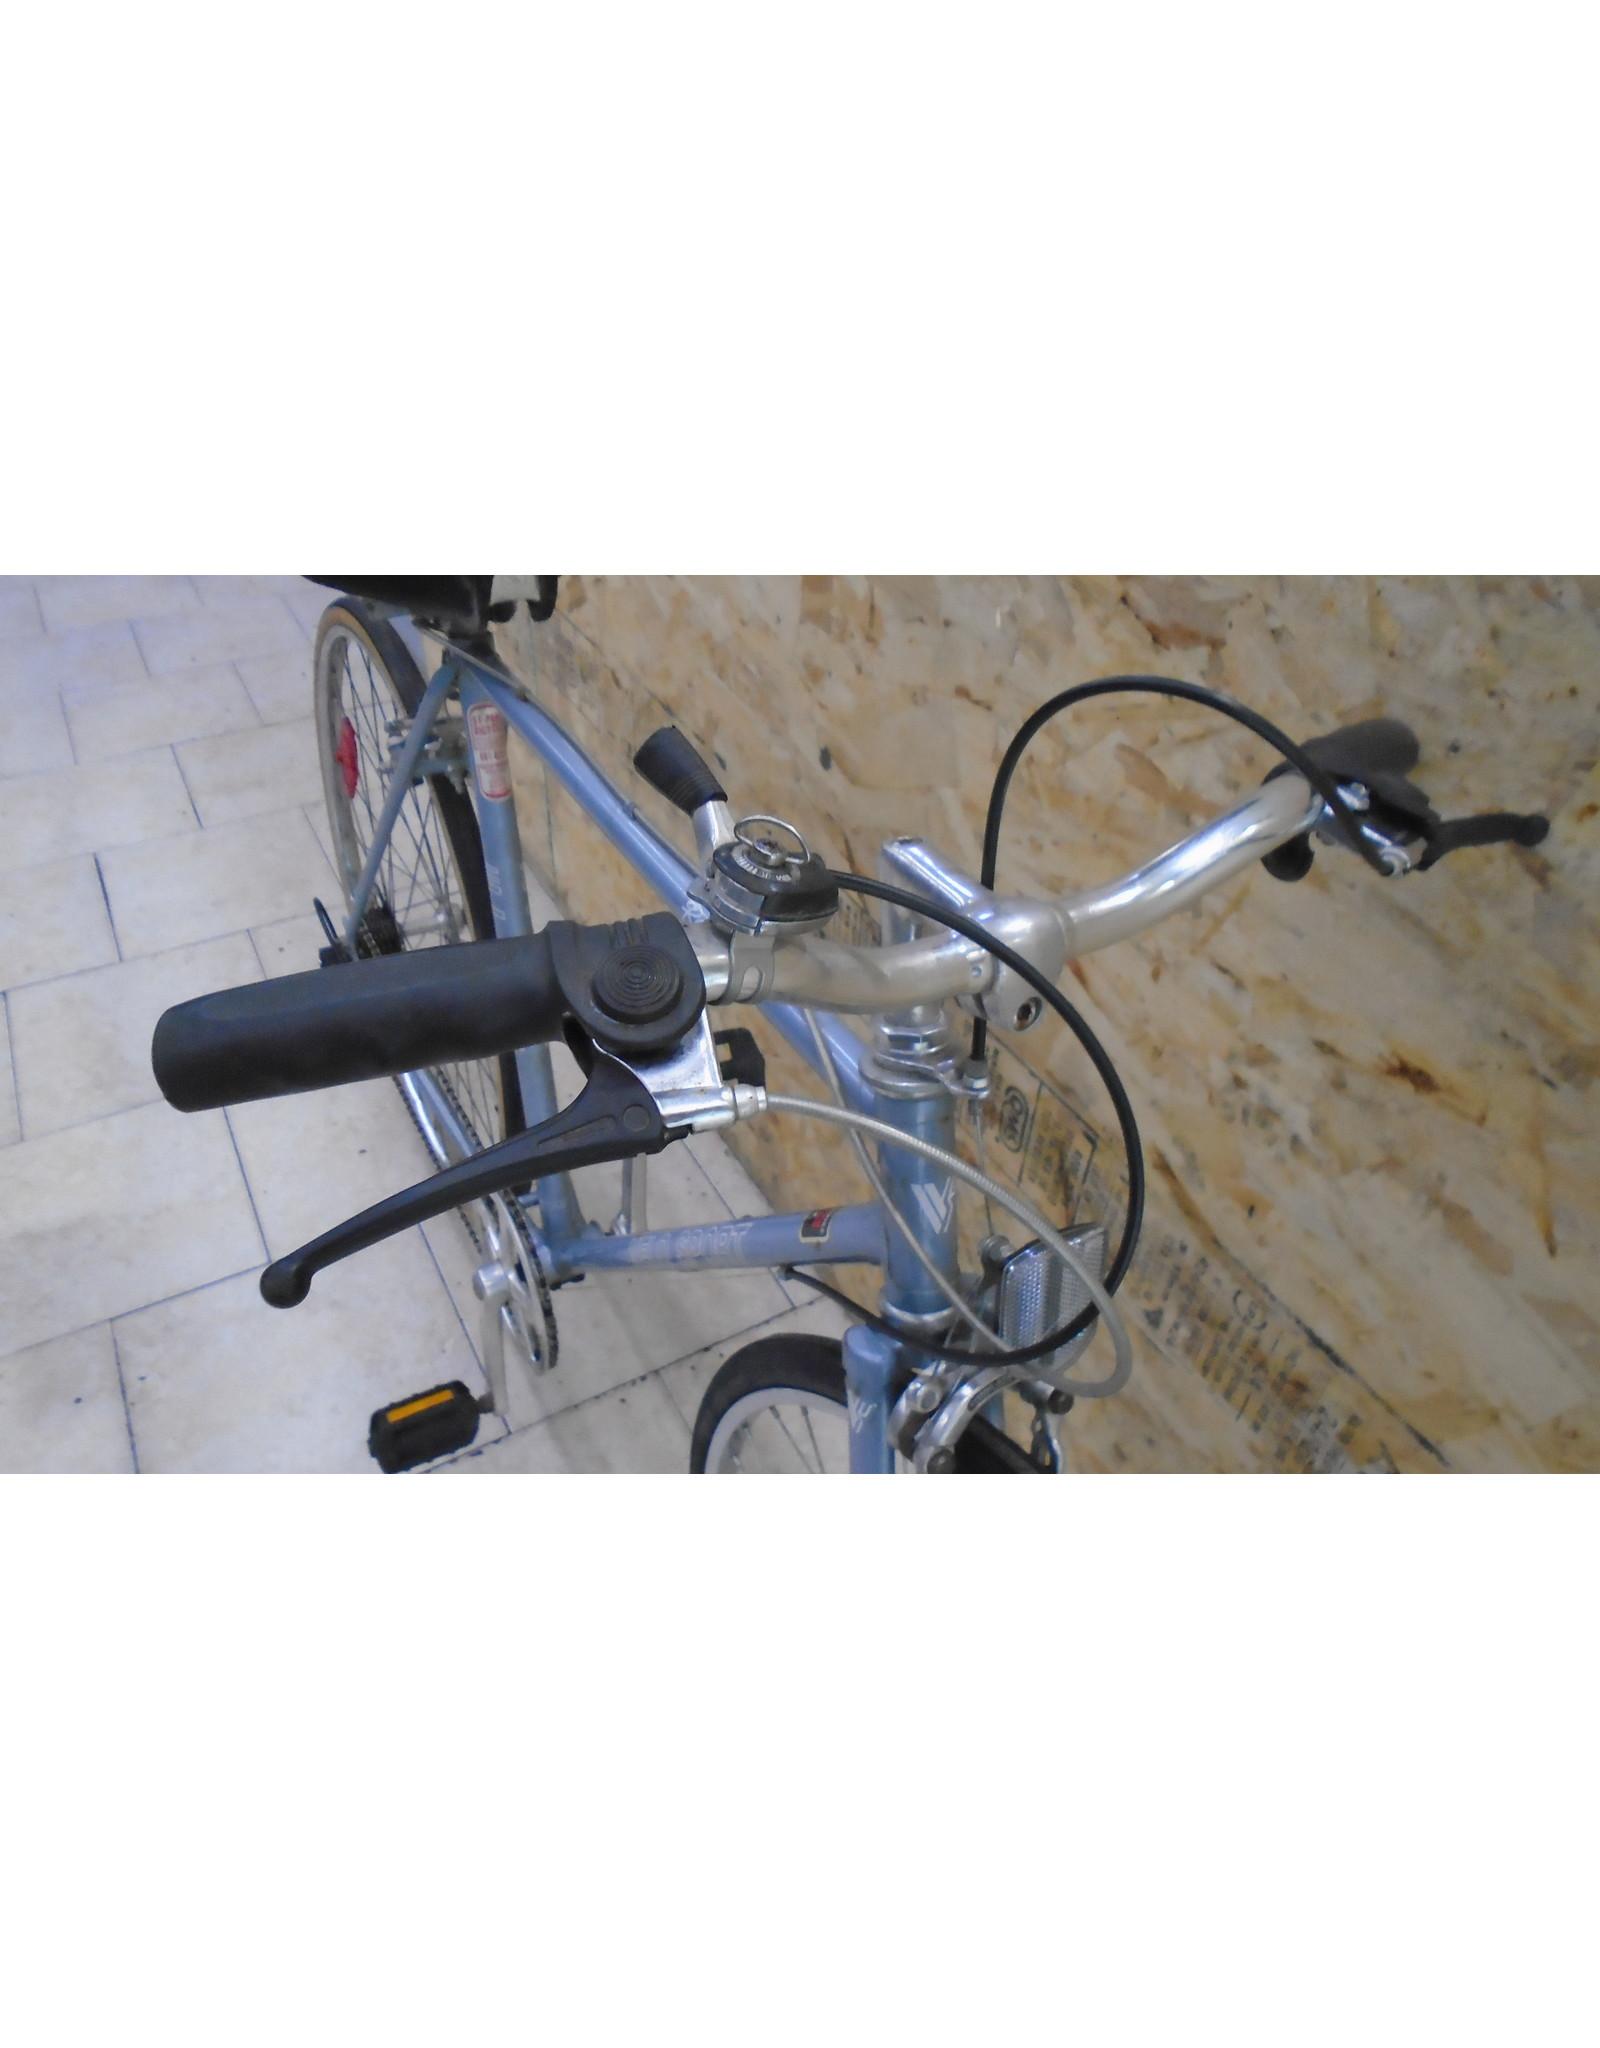 "Vélo usagé de ville Vélosport 22"" - 11241"